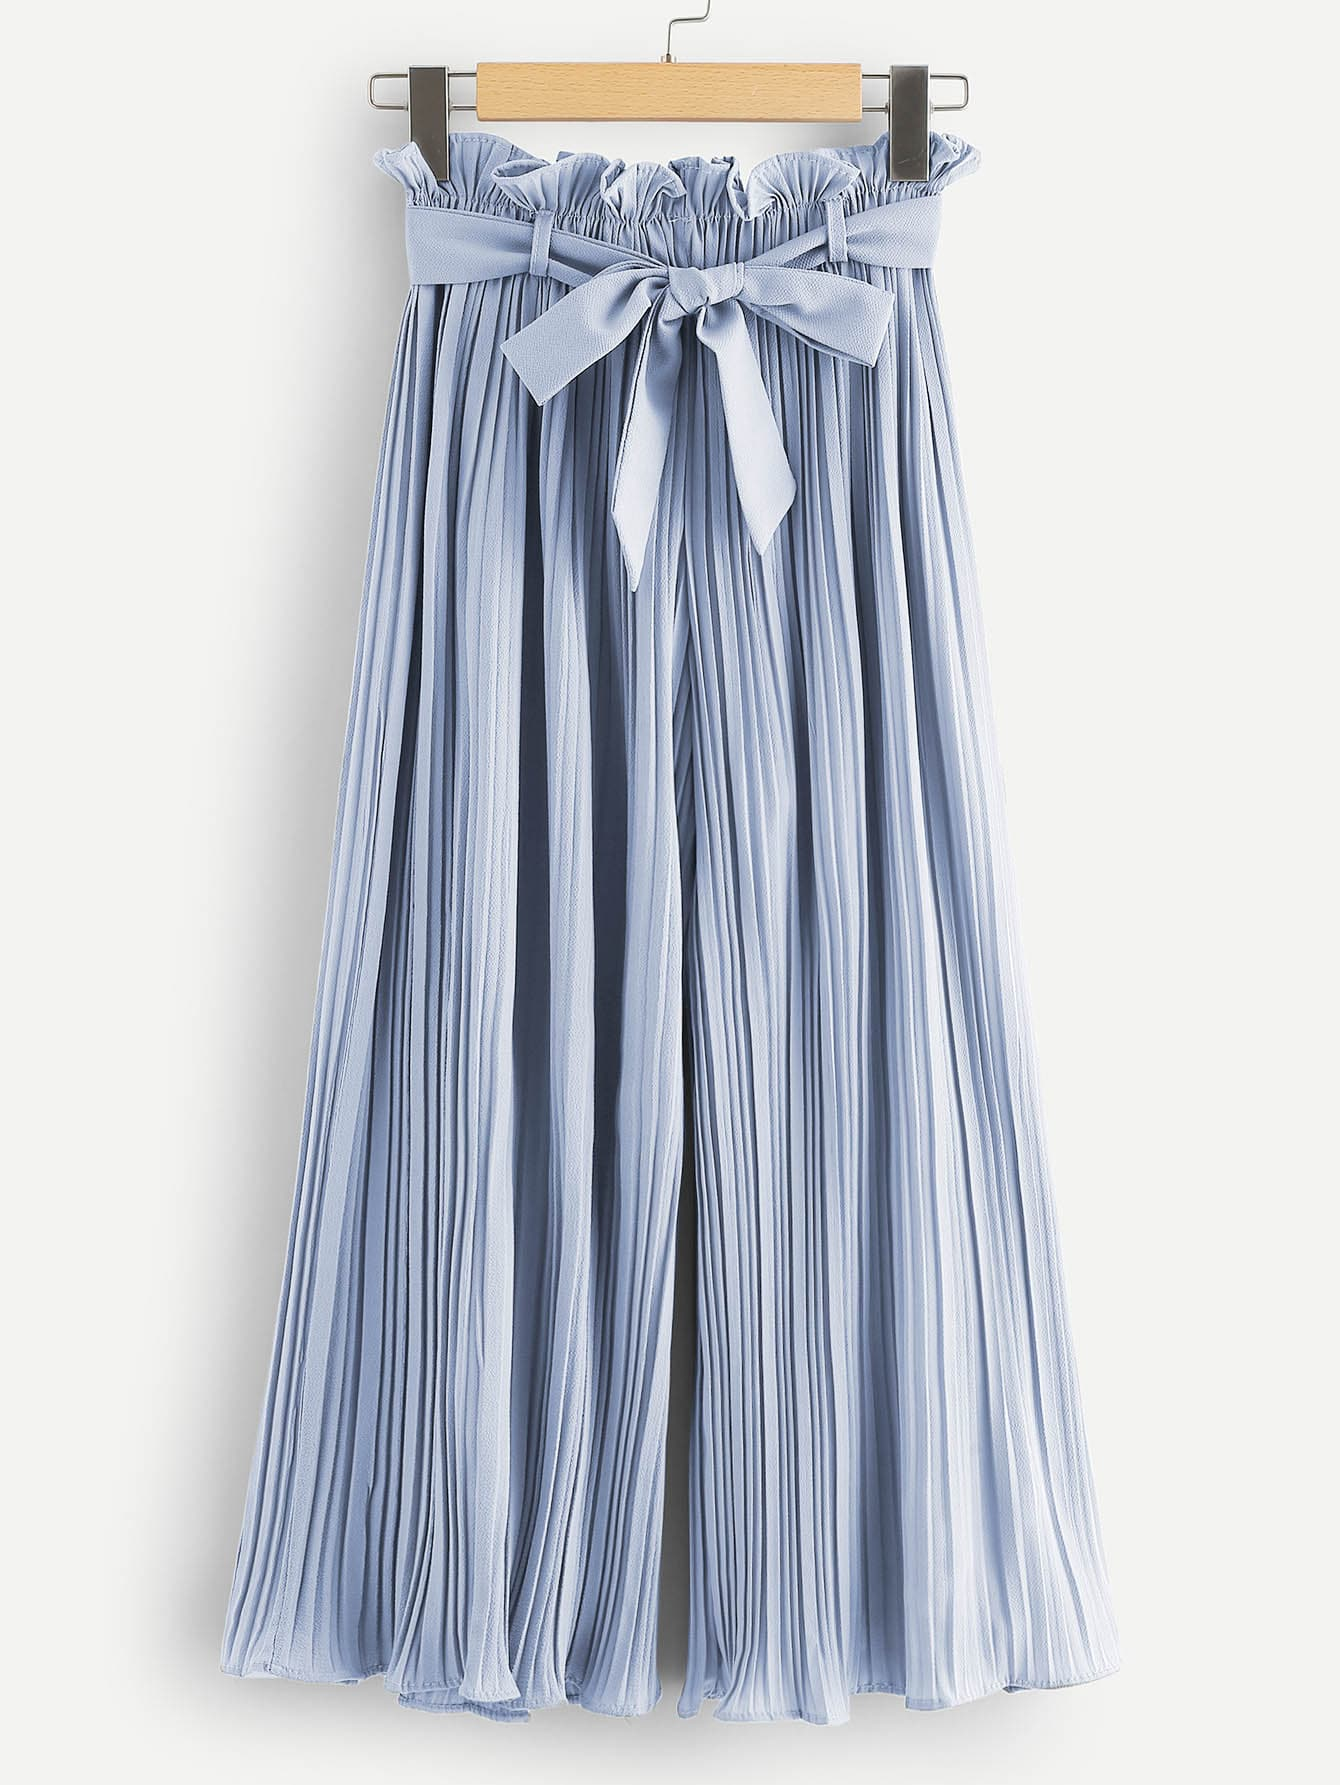 Self Tie Waist Frill Trim Pleated Pants frill trim bow tie front pants